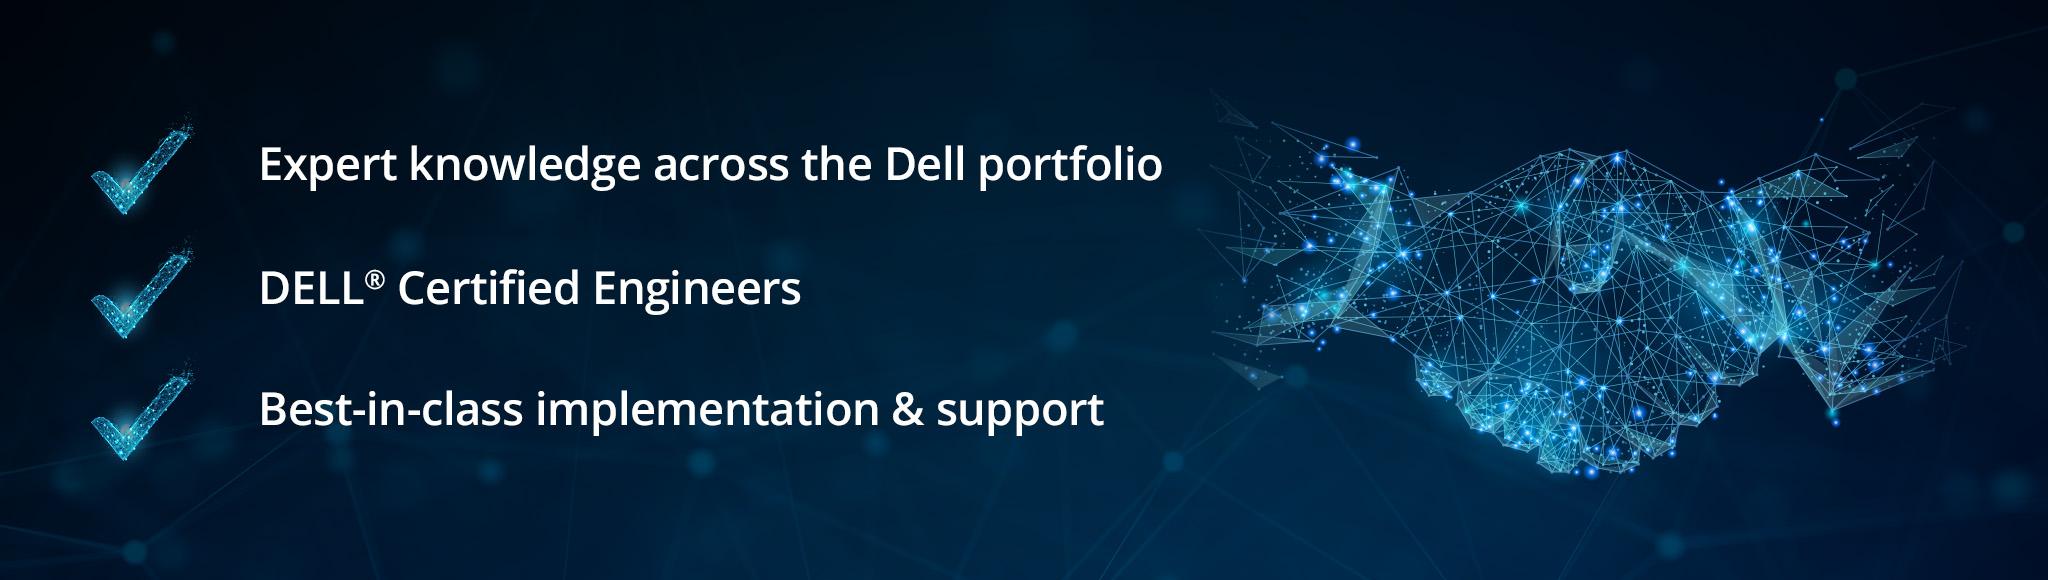 Intercomp Achieves Titanium Tier in the 2021 Dell Technologies Partner Program